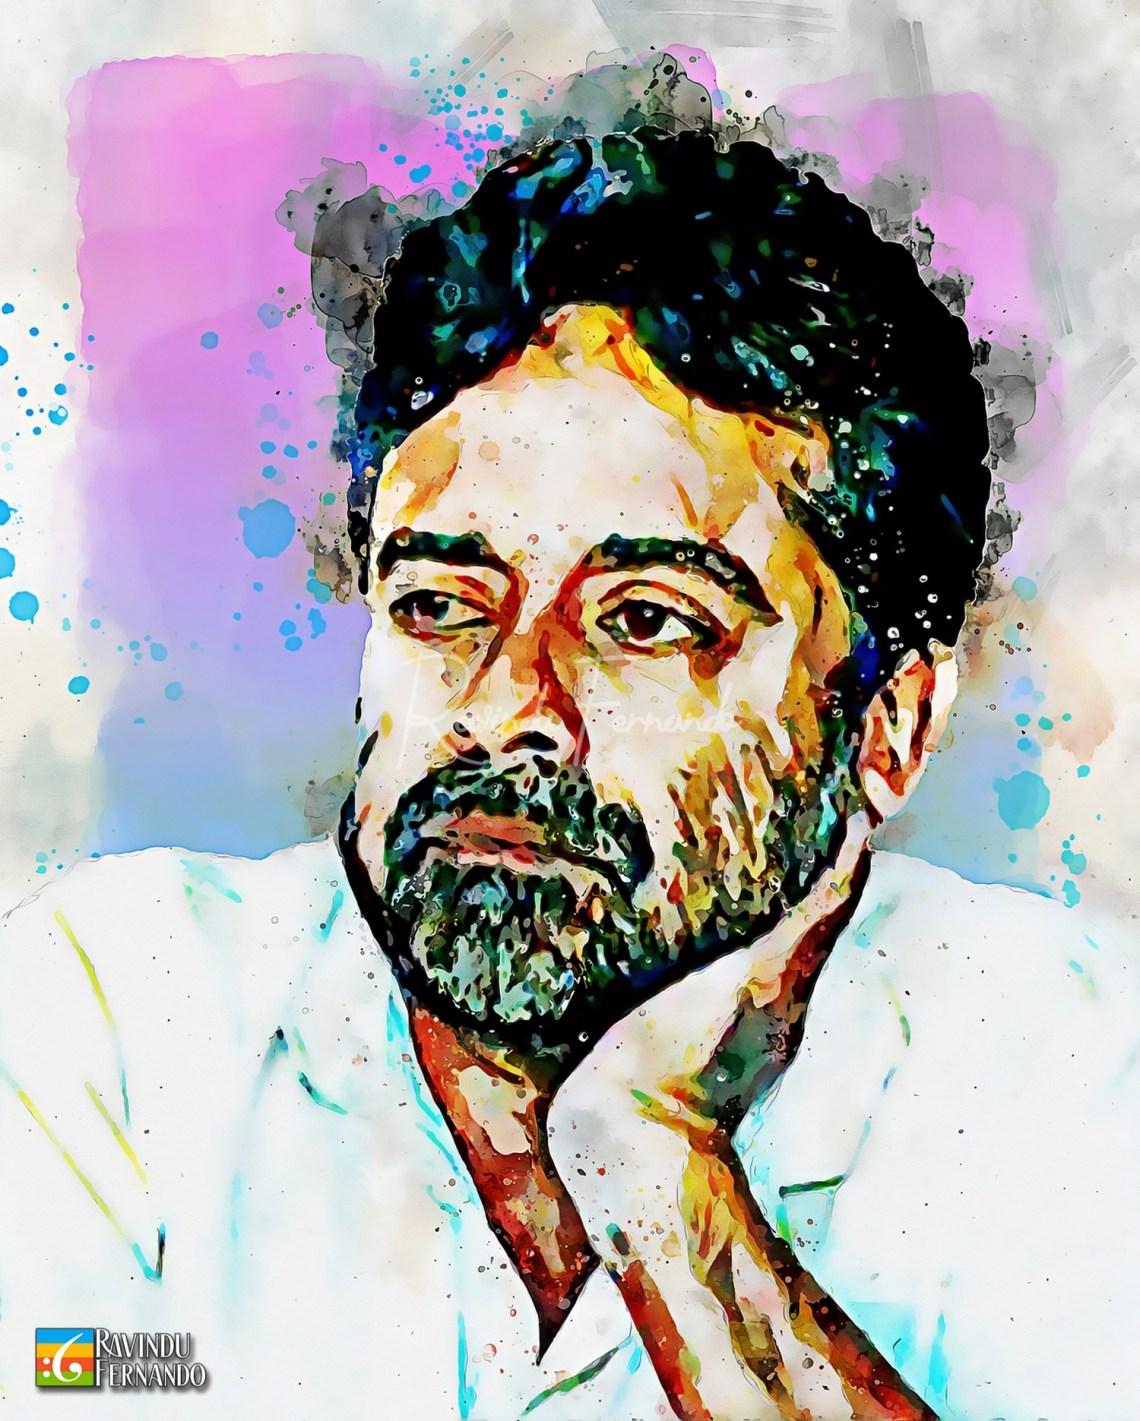 Shyam Fernando - Digital Watercolor Painting